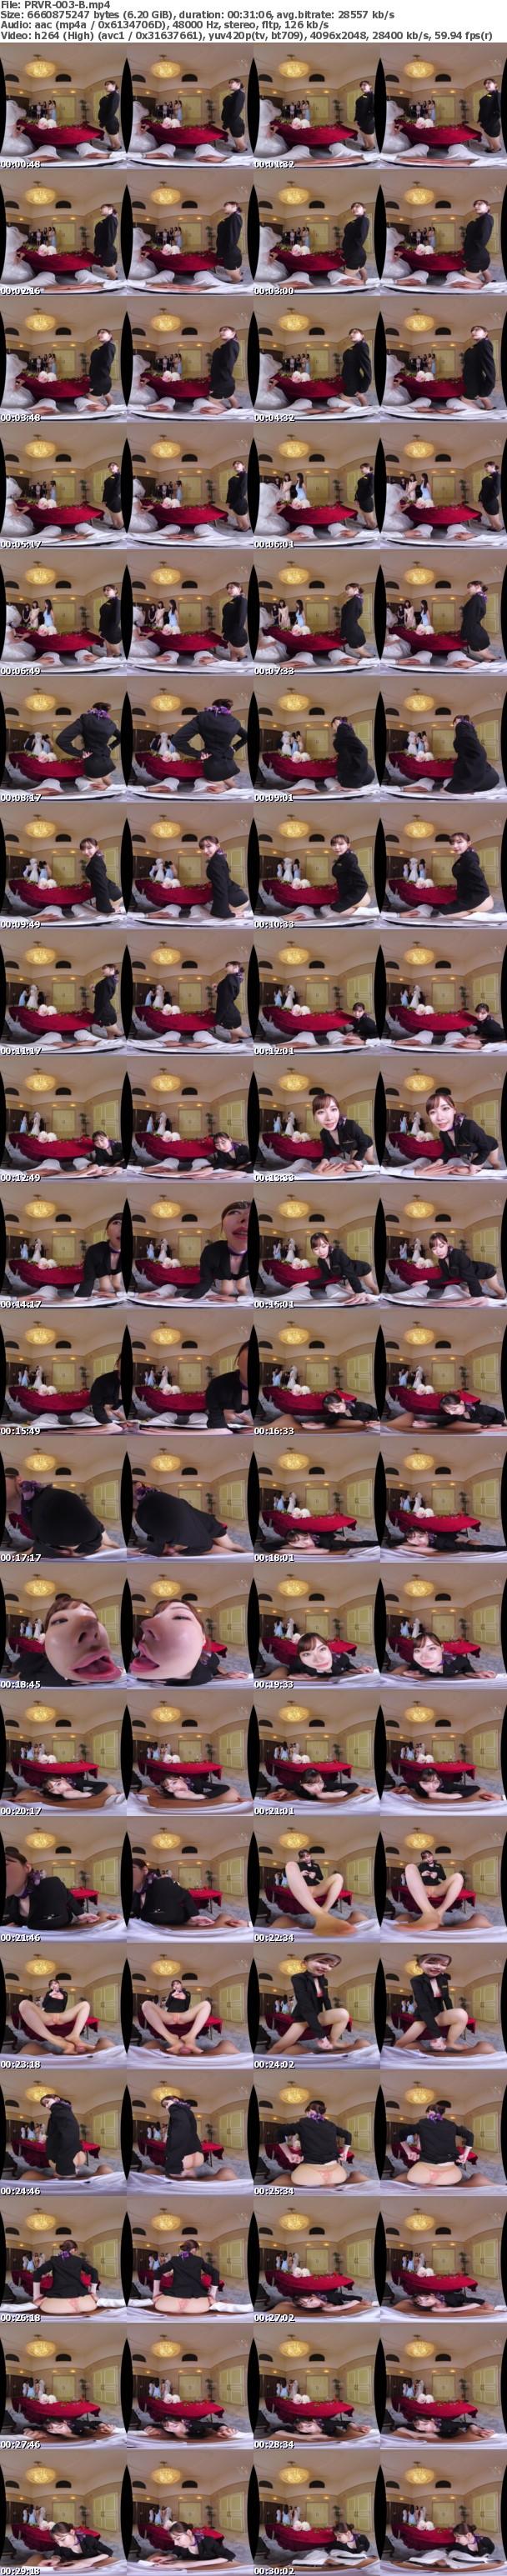 (VR) PRVR-003 【HQ高画質】SNSで大反響となった「永遠の愛をブチ壊すウエディングプランナー」VR登場! 新婦の隣で全力誘惑してくる巨乳美女!ドキドキ空気感と大量淫語でタップリ中出し絞り取られるボク! 深田えいみ